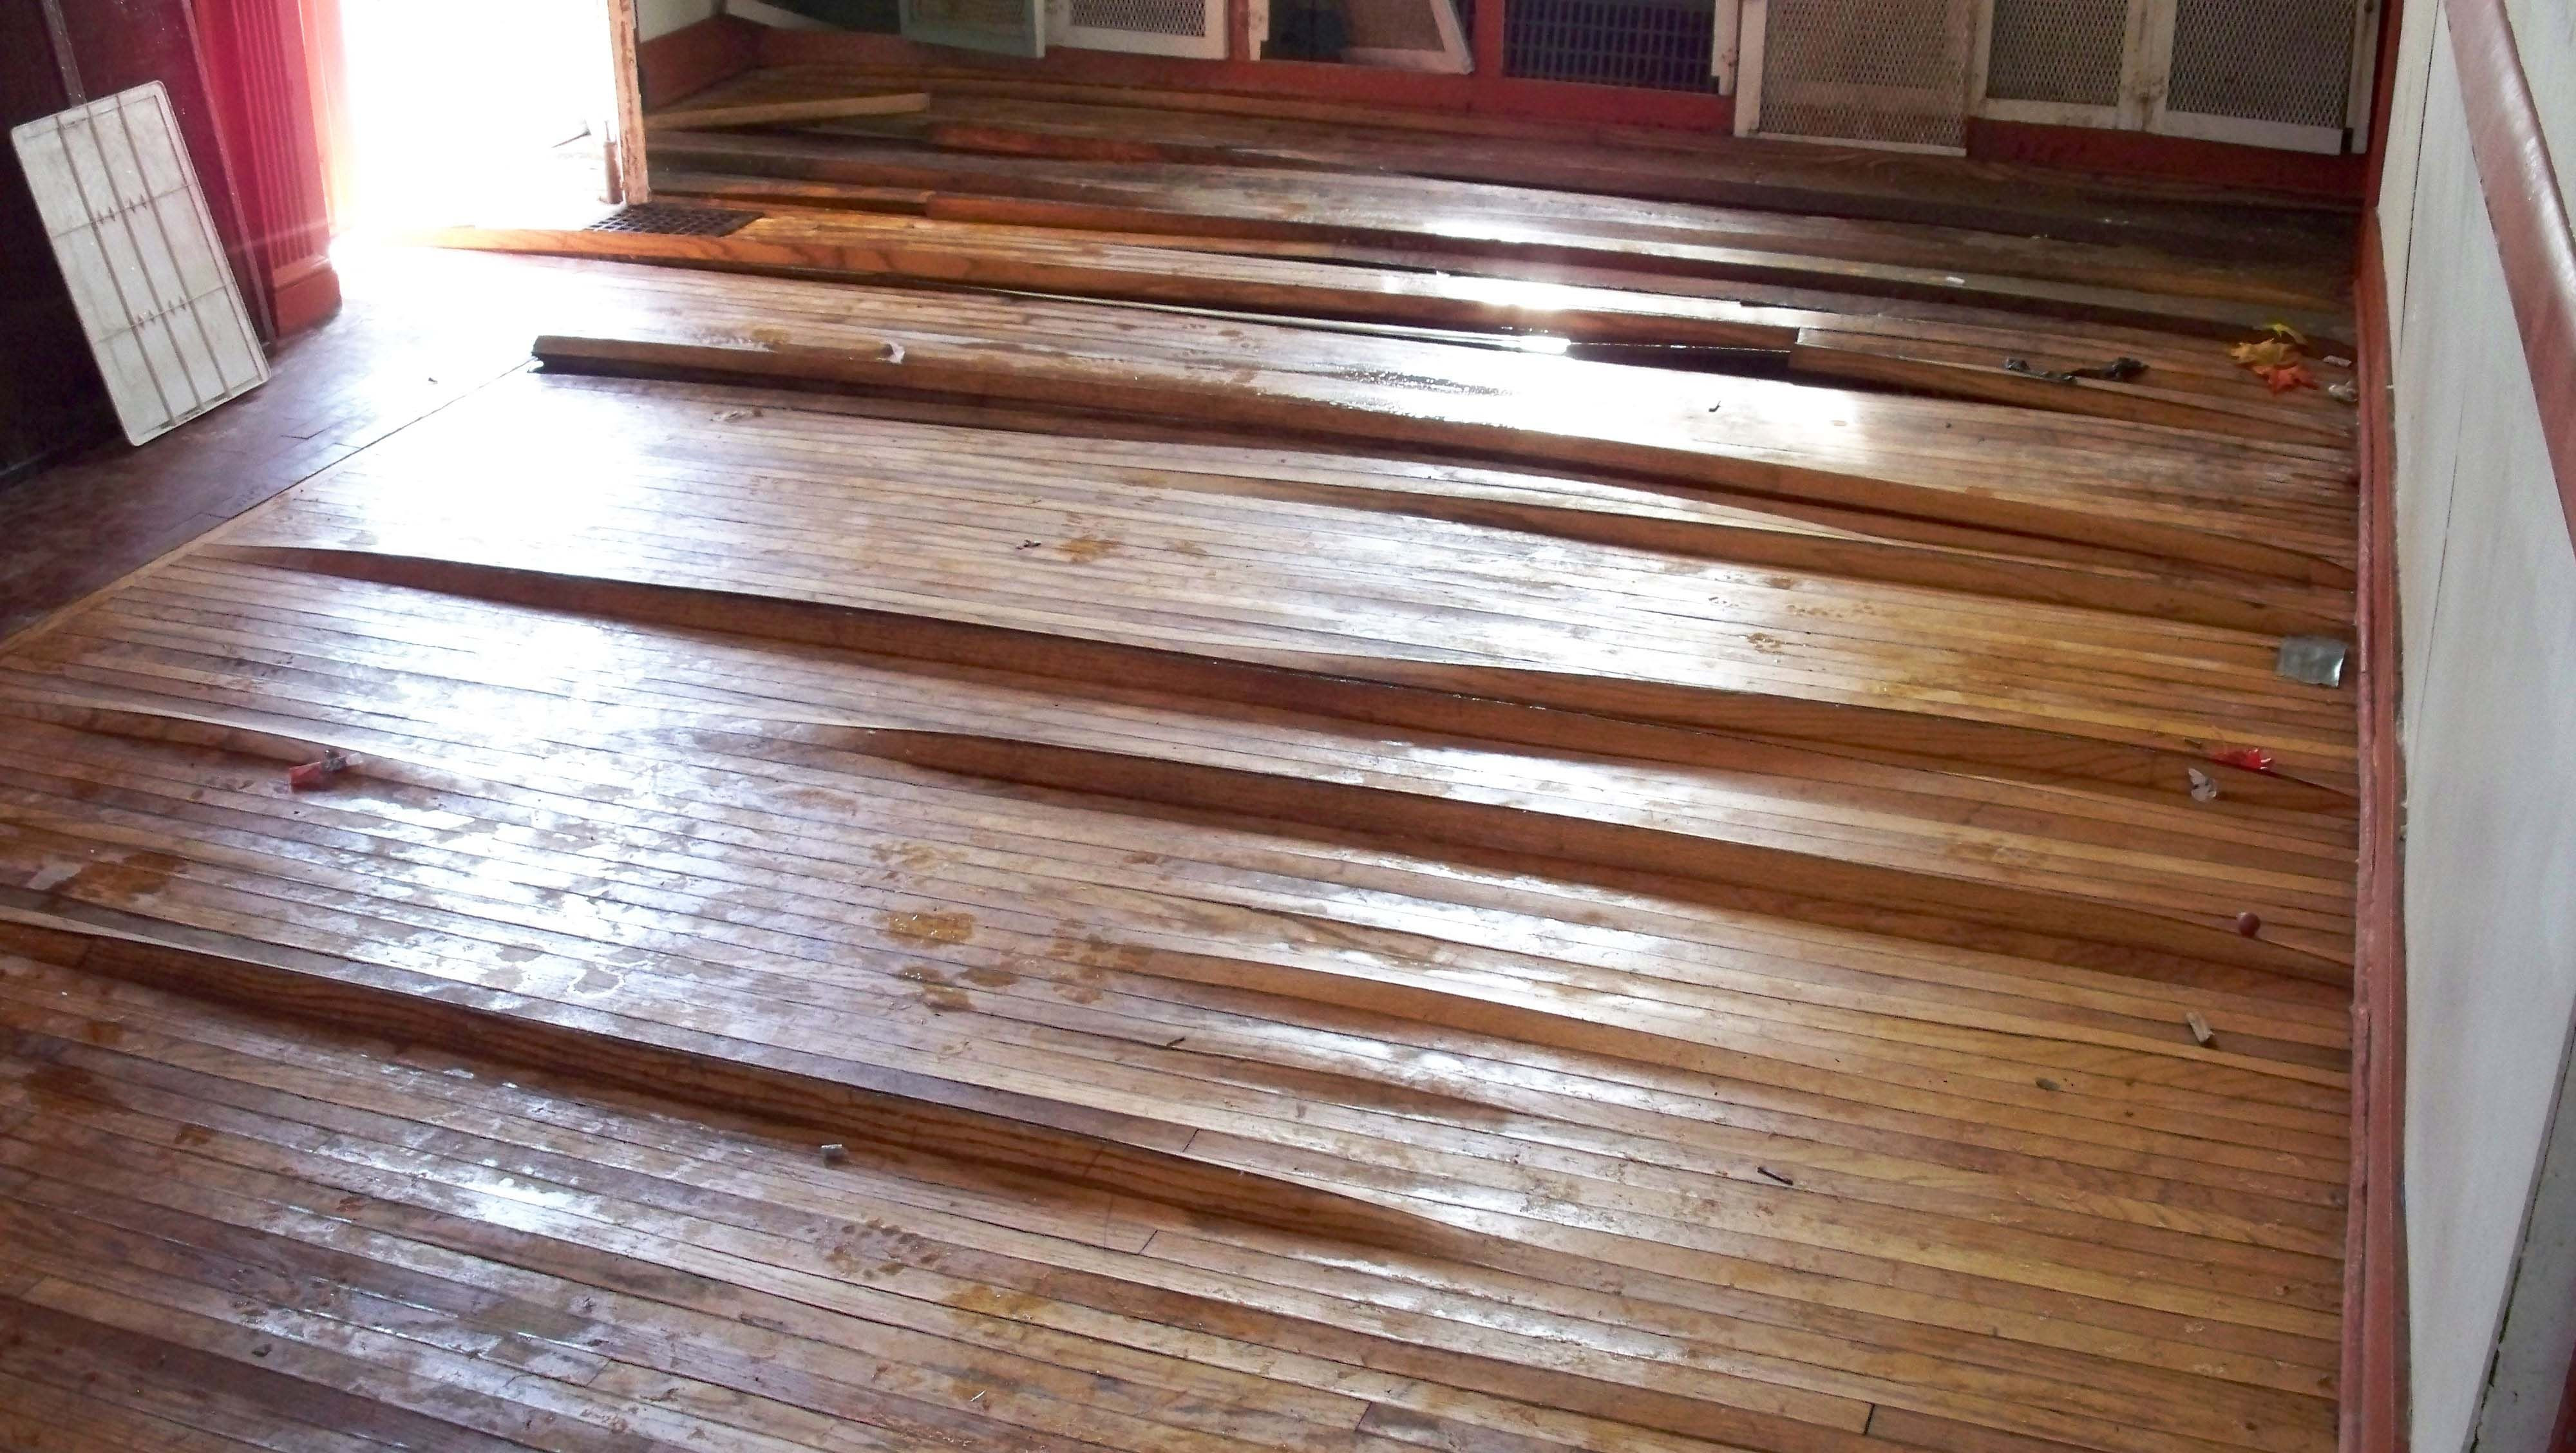 ss hardwood floors of stain hardwood floors hardwood flooring add the classic look and throughout gallery of stain hardwood floors hardwood flooring add the classic look and feel of hardwood